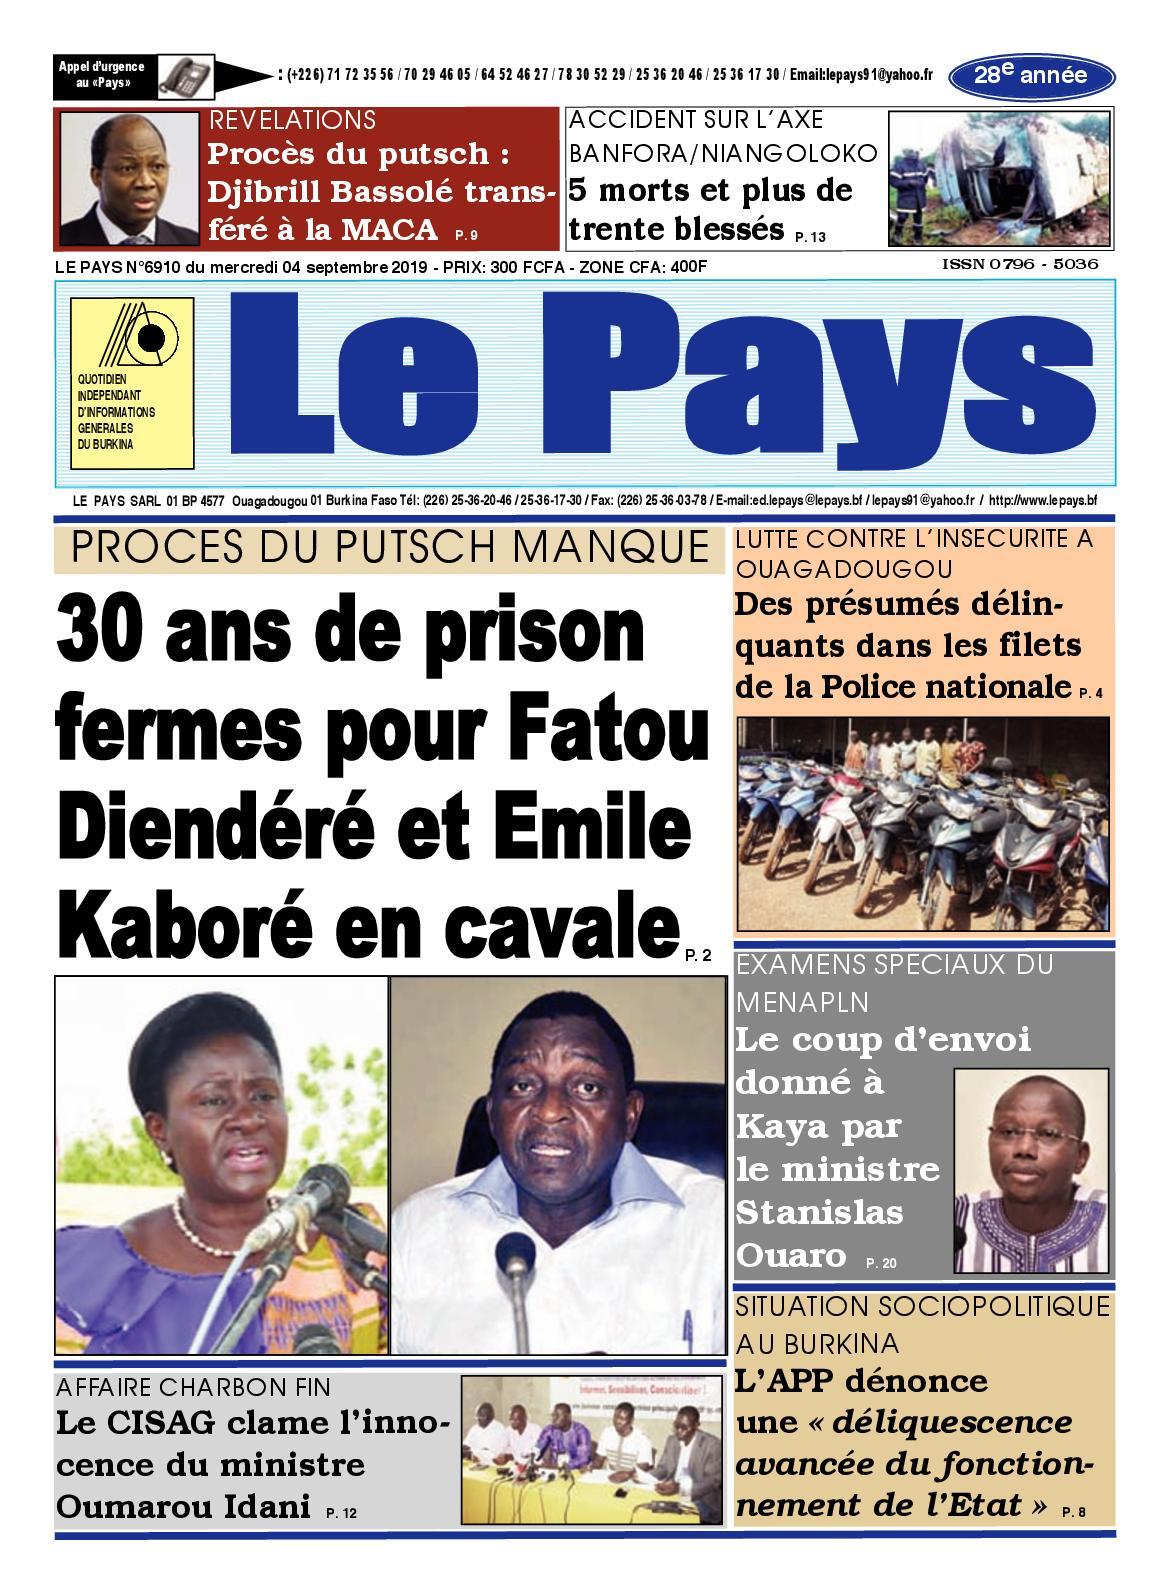 Rencontres sérieuses femmes Banfora Burkina Faso